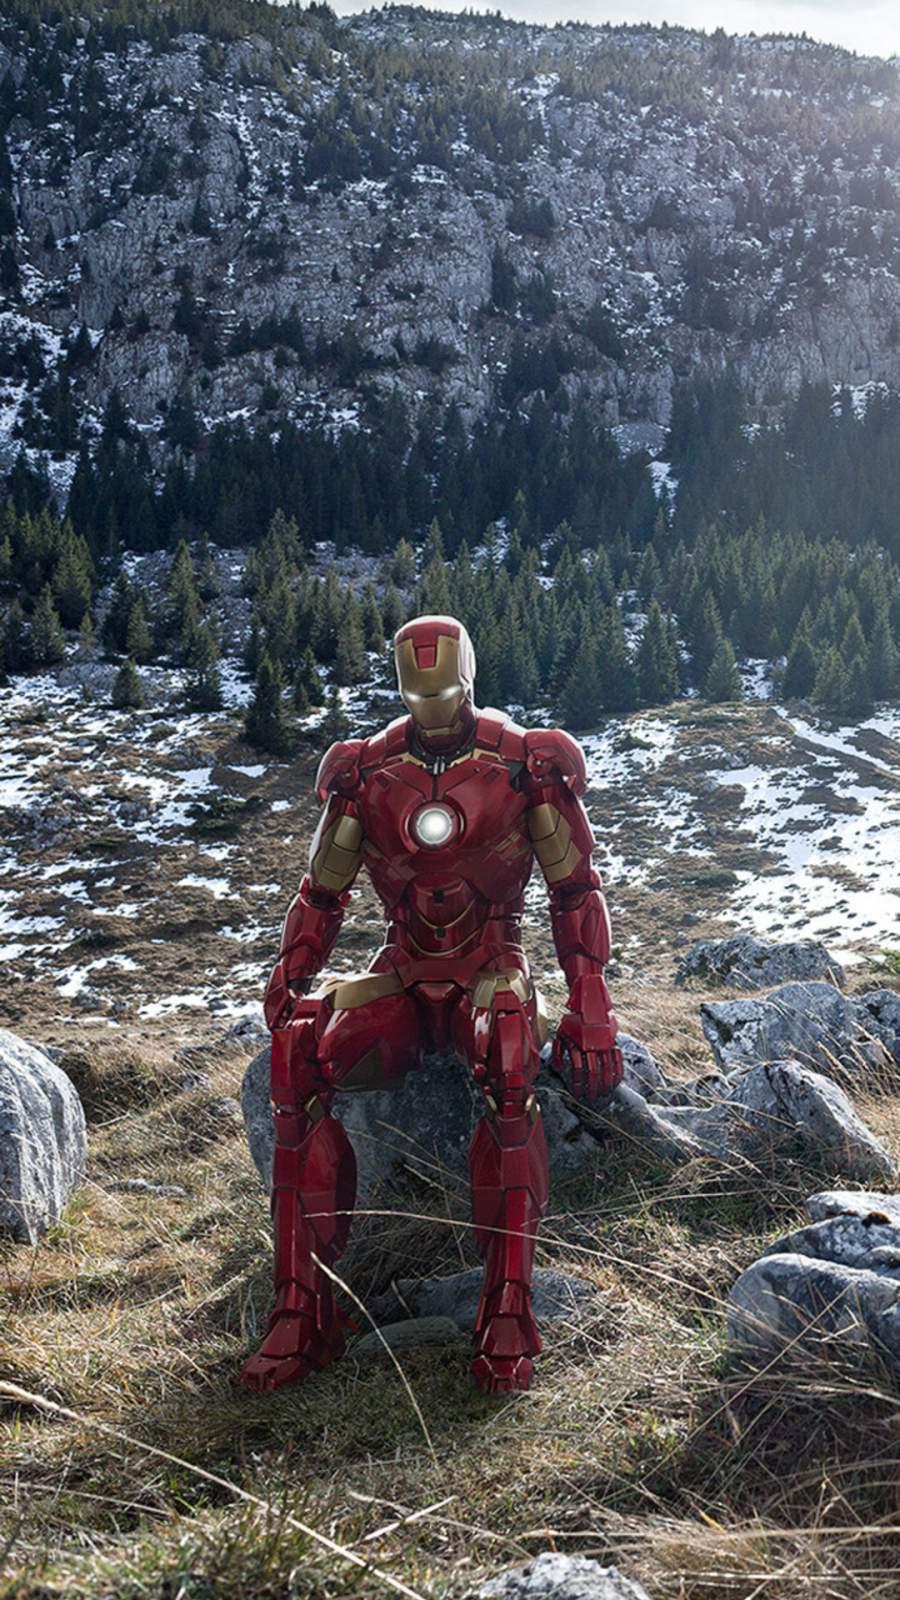 Iron Man Sitting on Stone Mountains iPhone Wallpaper